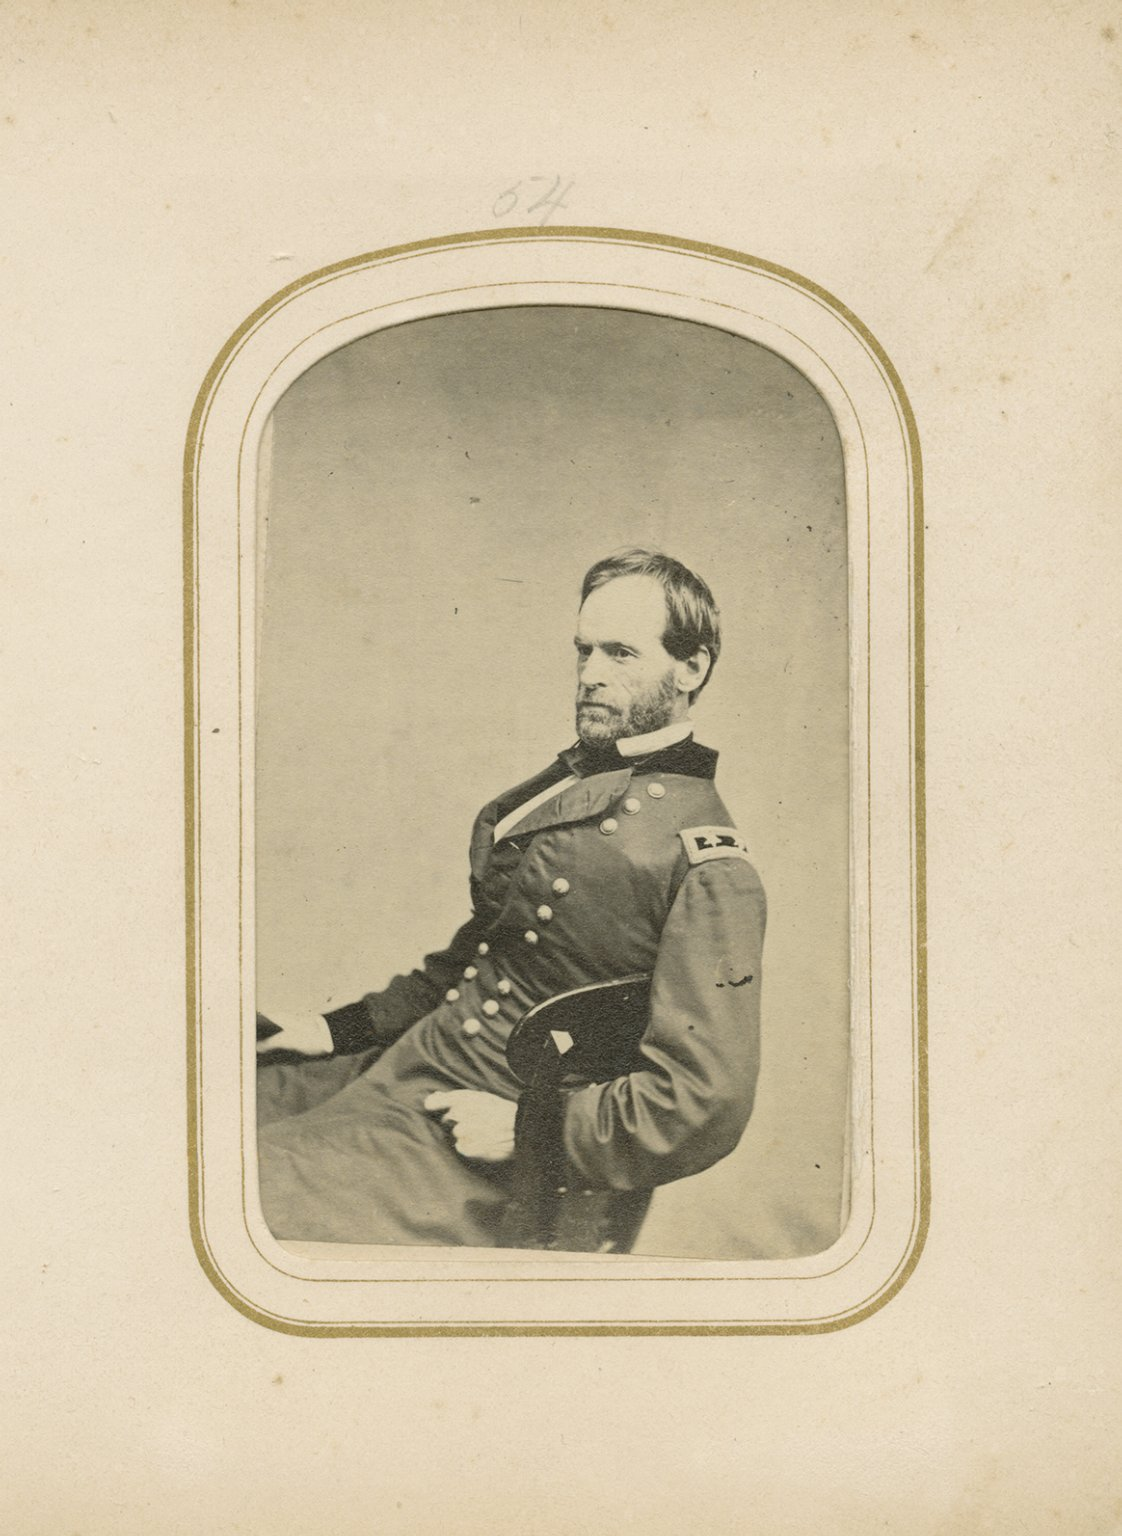 Gen. William Tecumseh Sherman